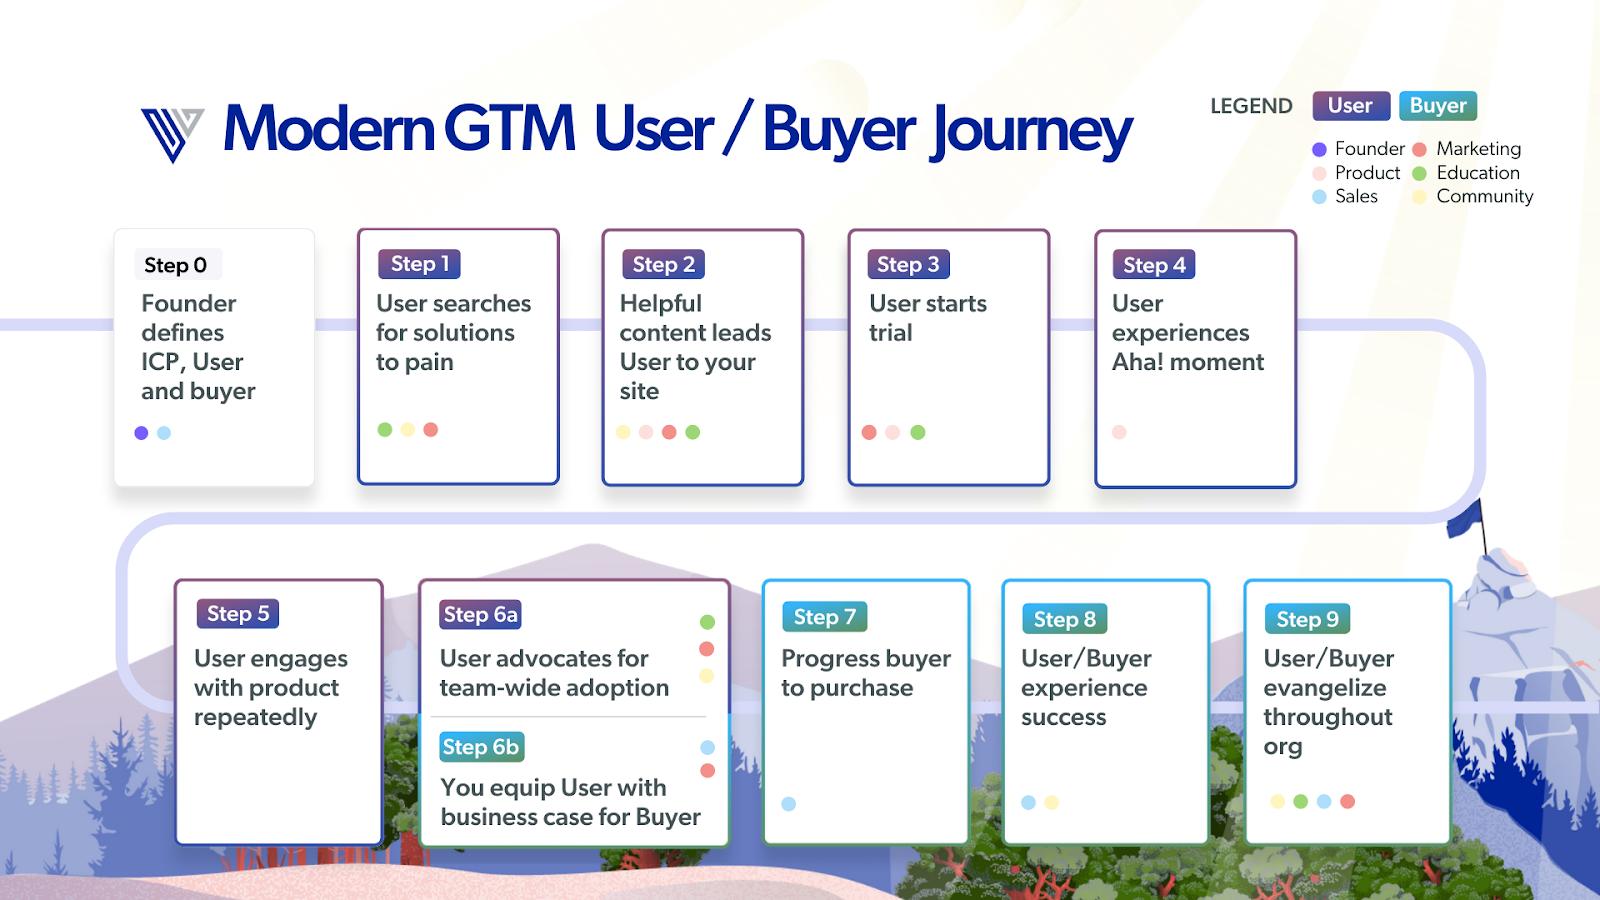 Modern GTM User/Buyer Journey